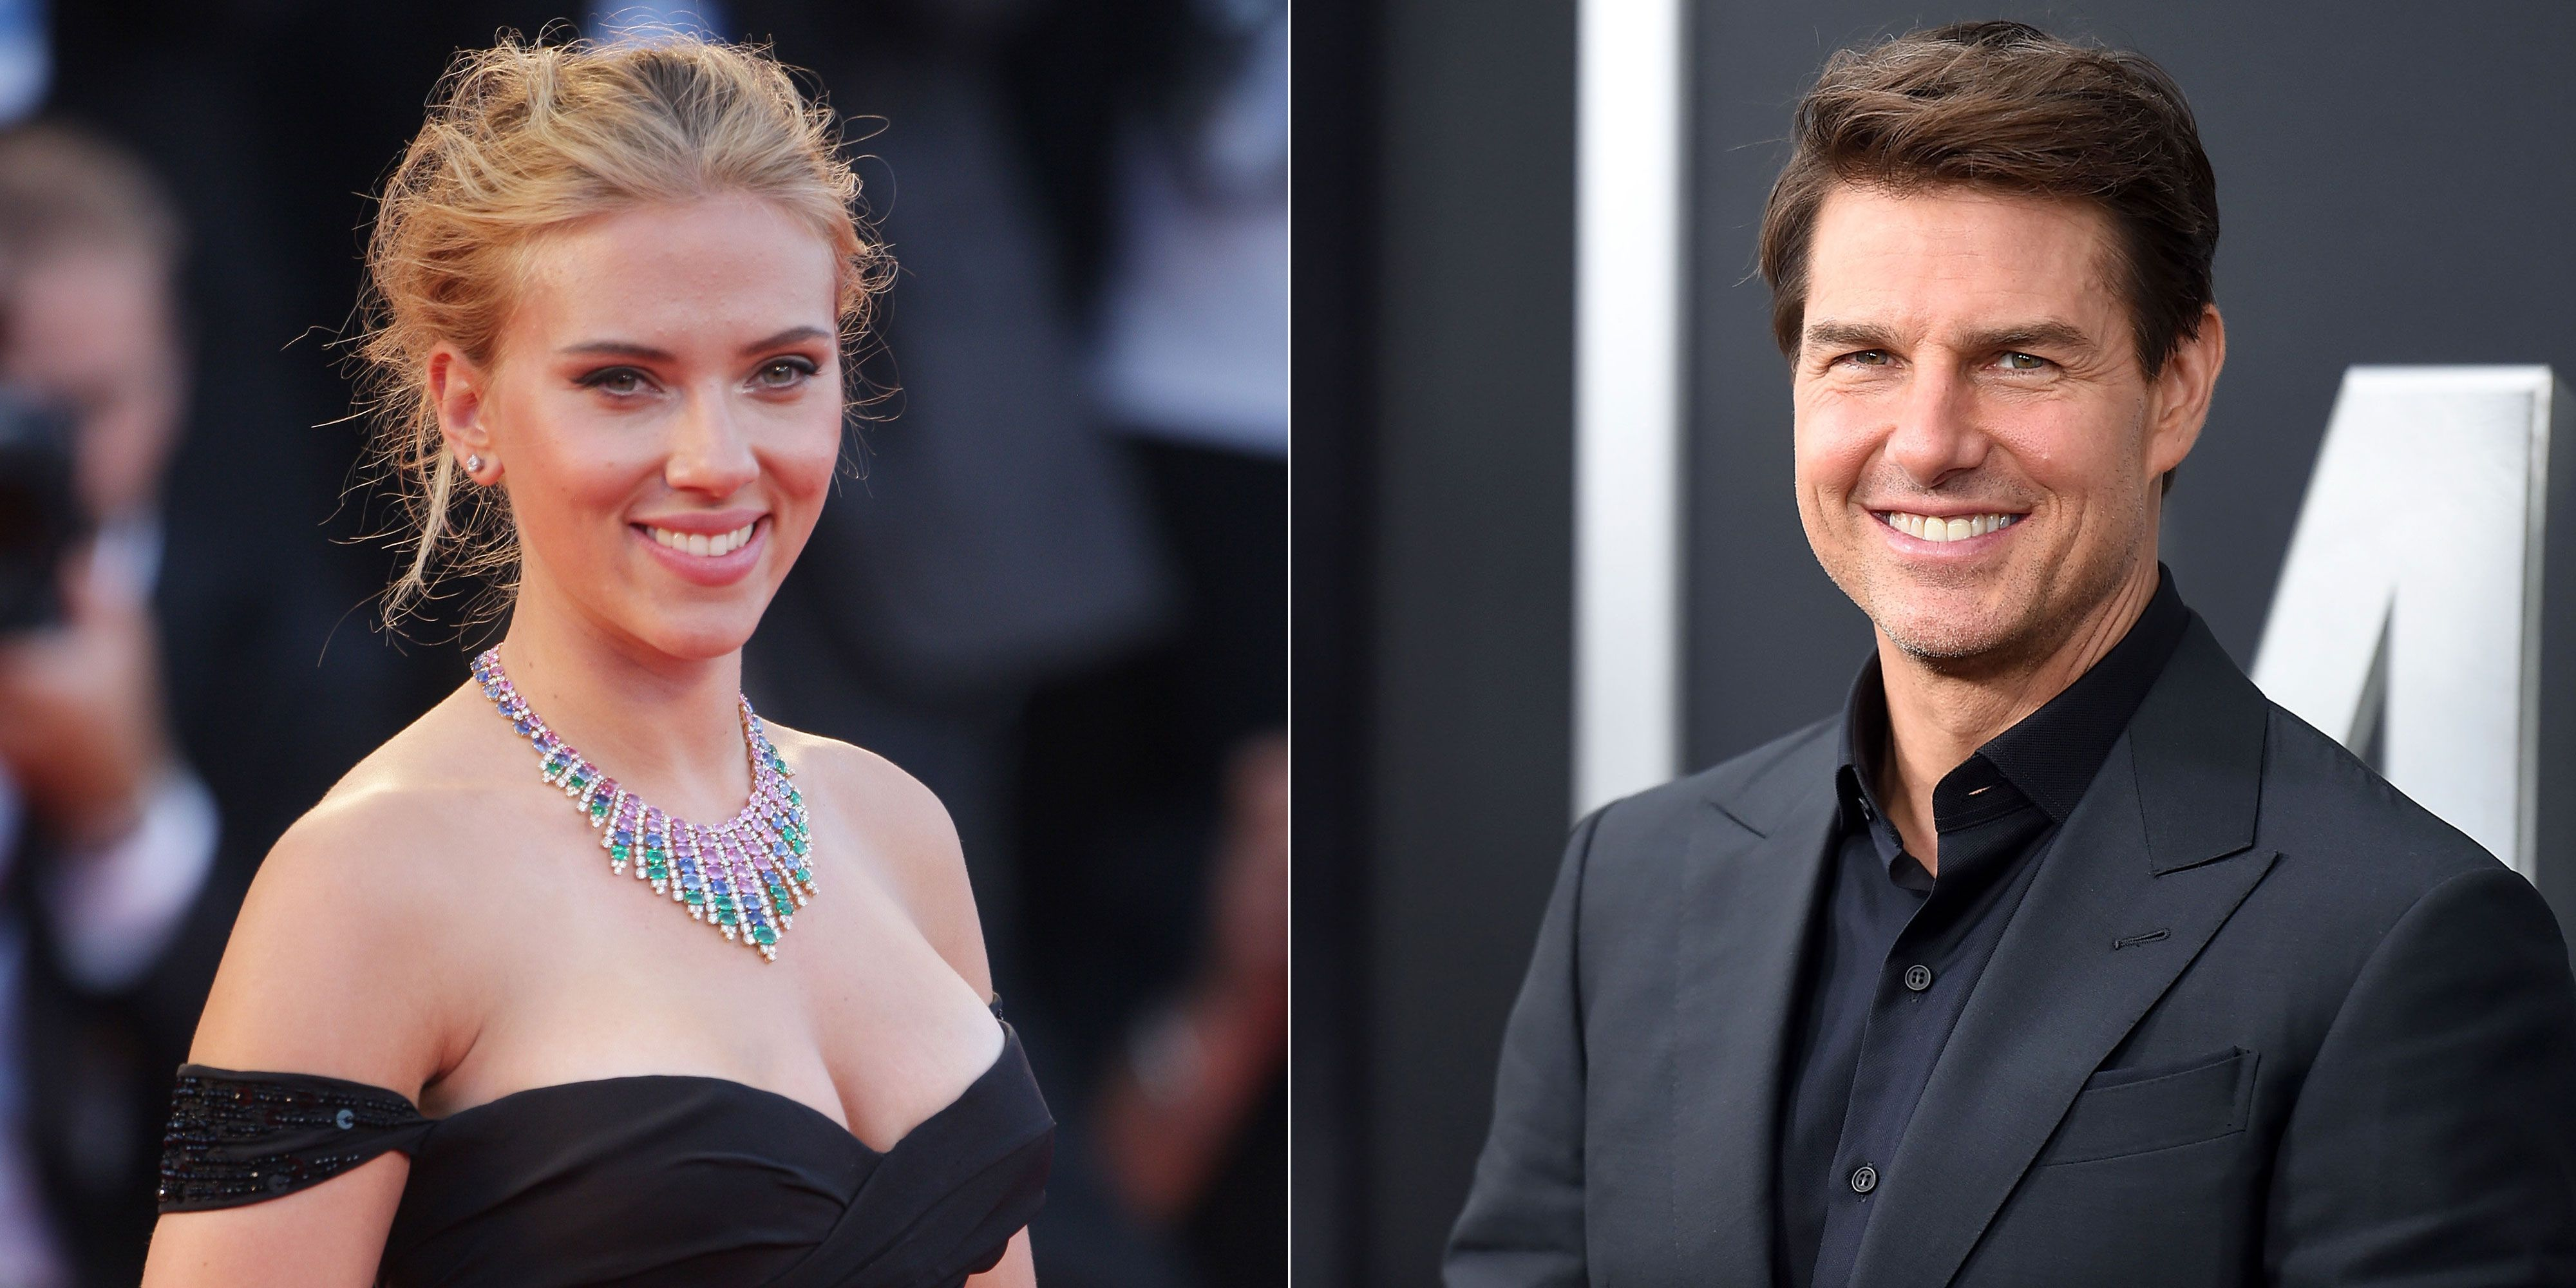 Scarlett Johansson and Tom Cruise